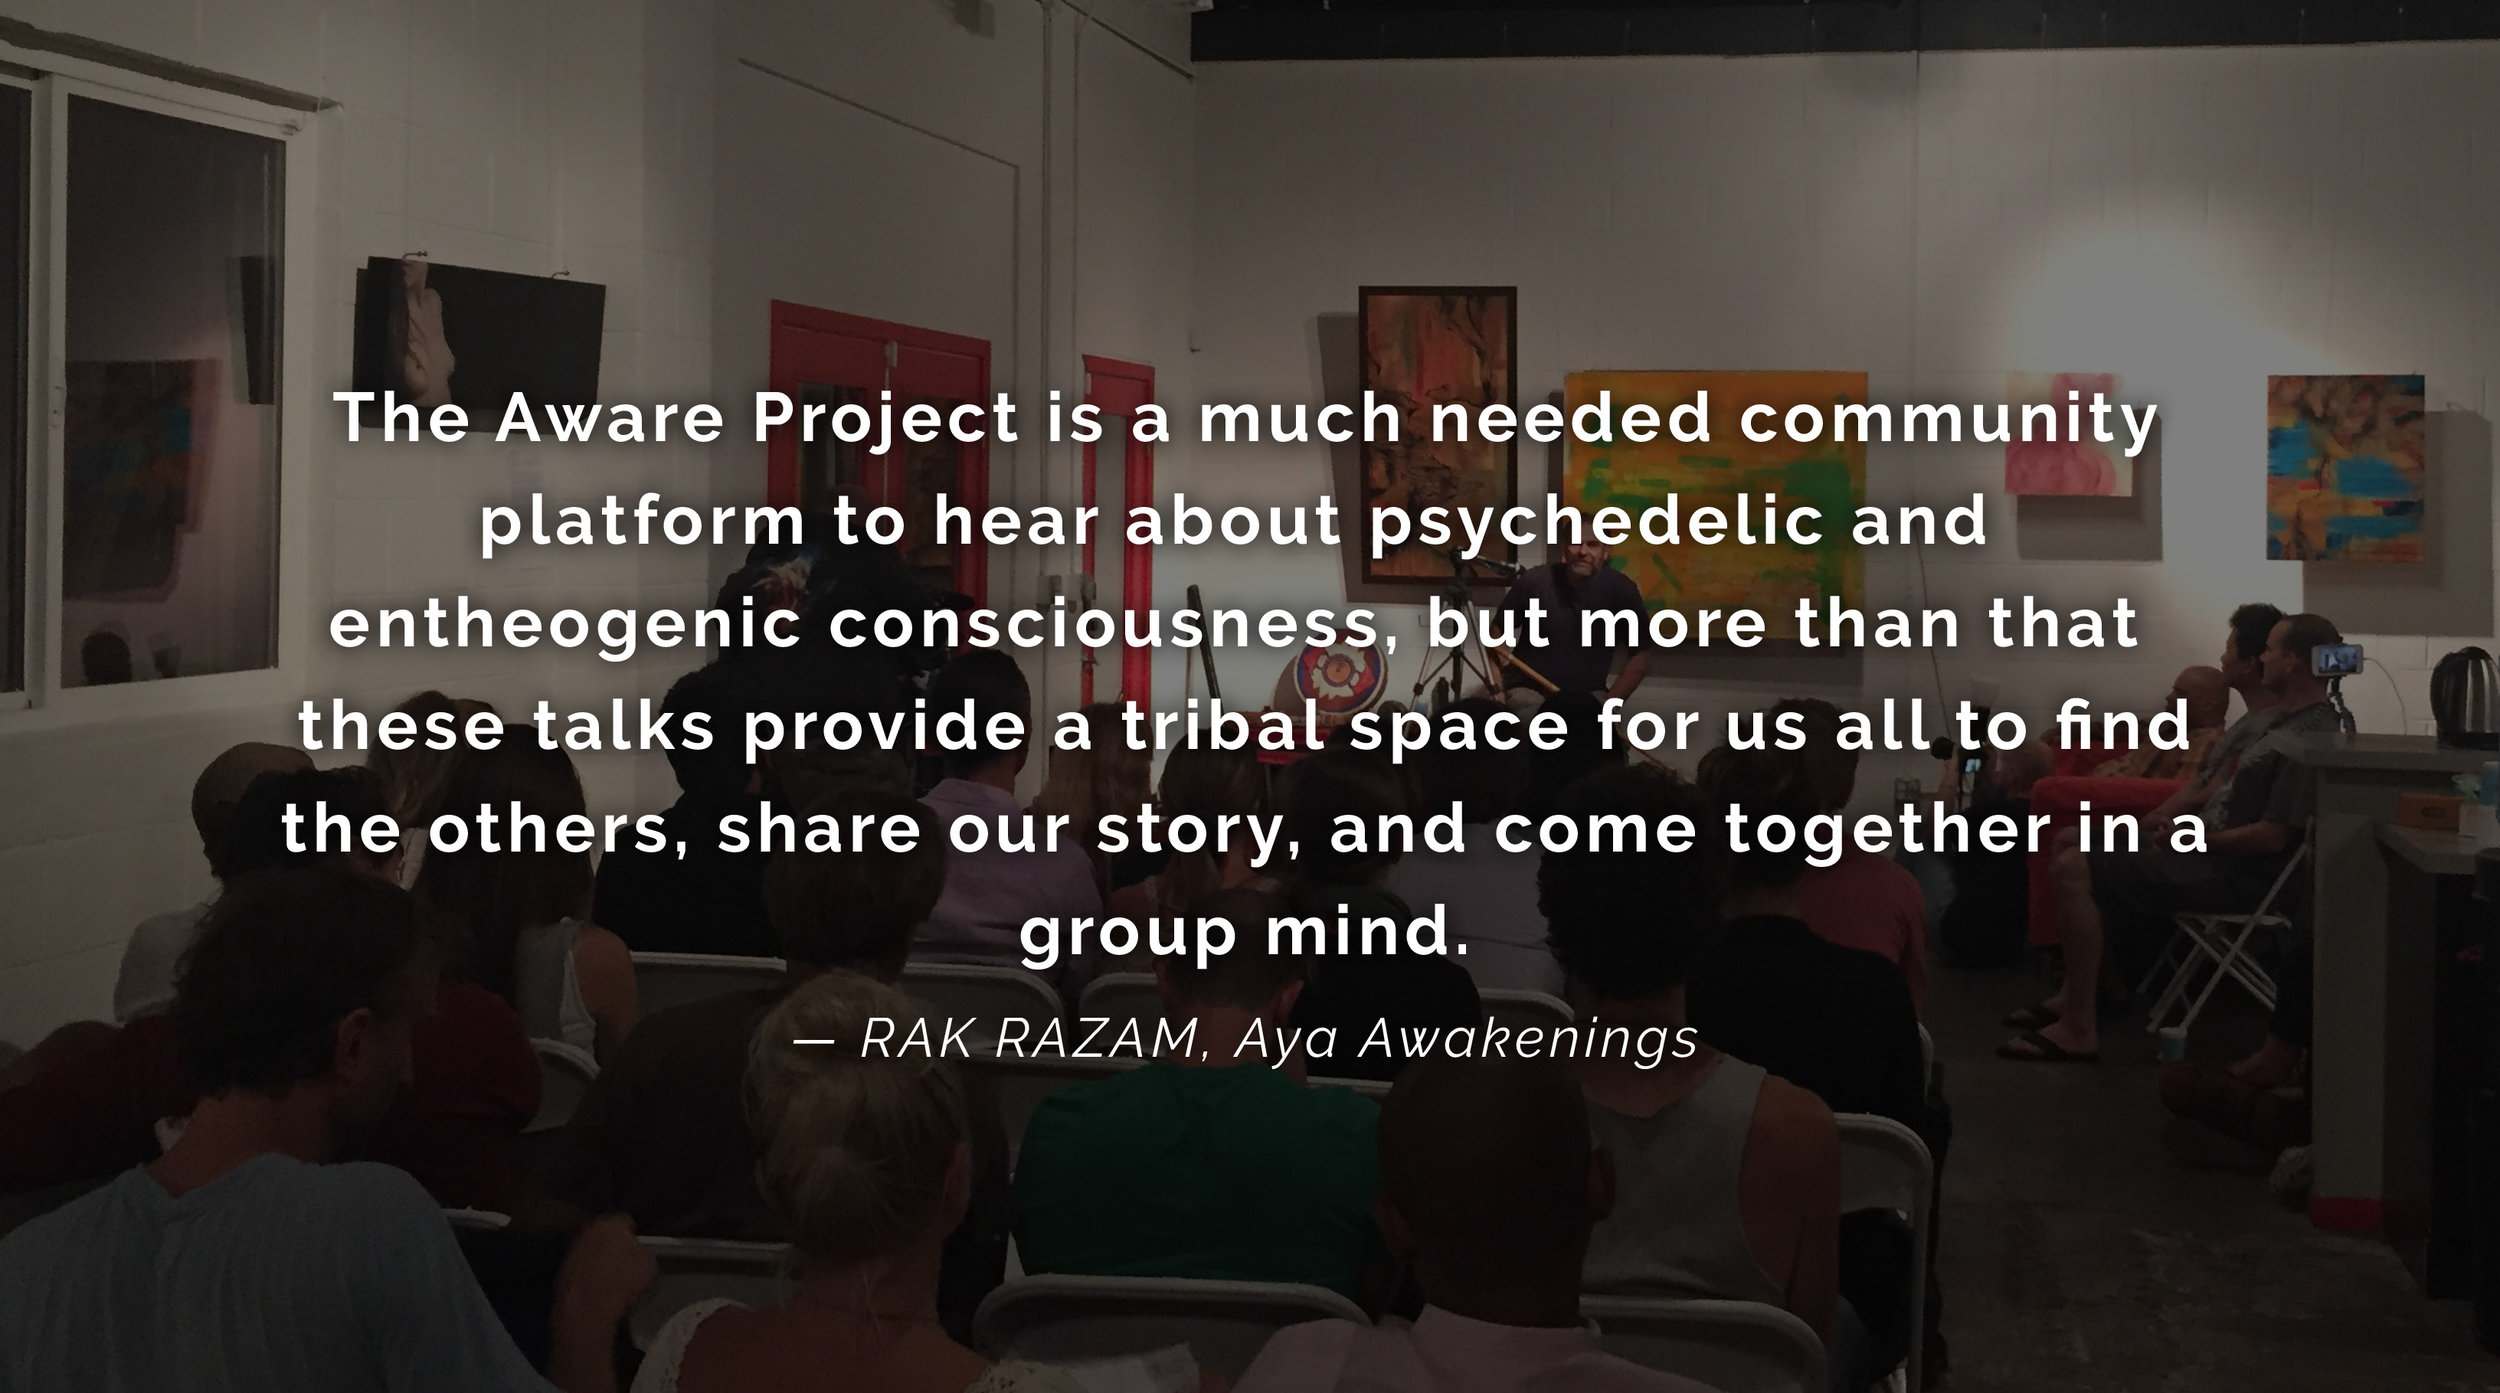 Rak Razam Ayahuasca & Psychedelic Journalist Quote